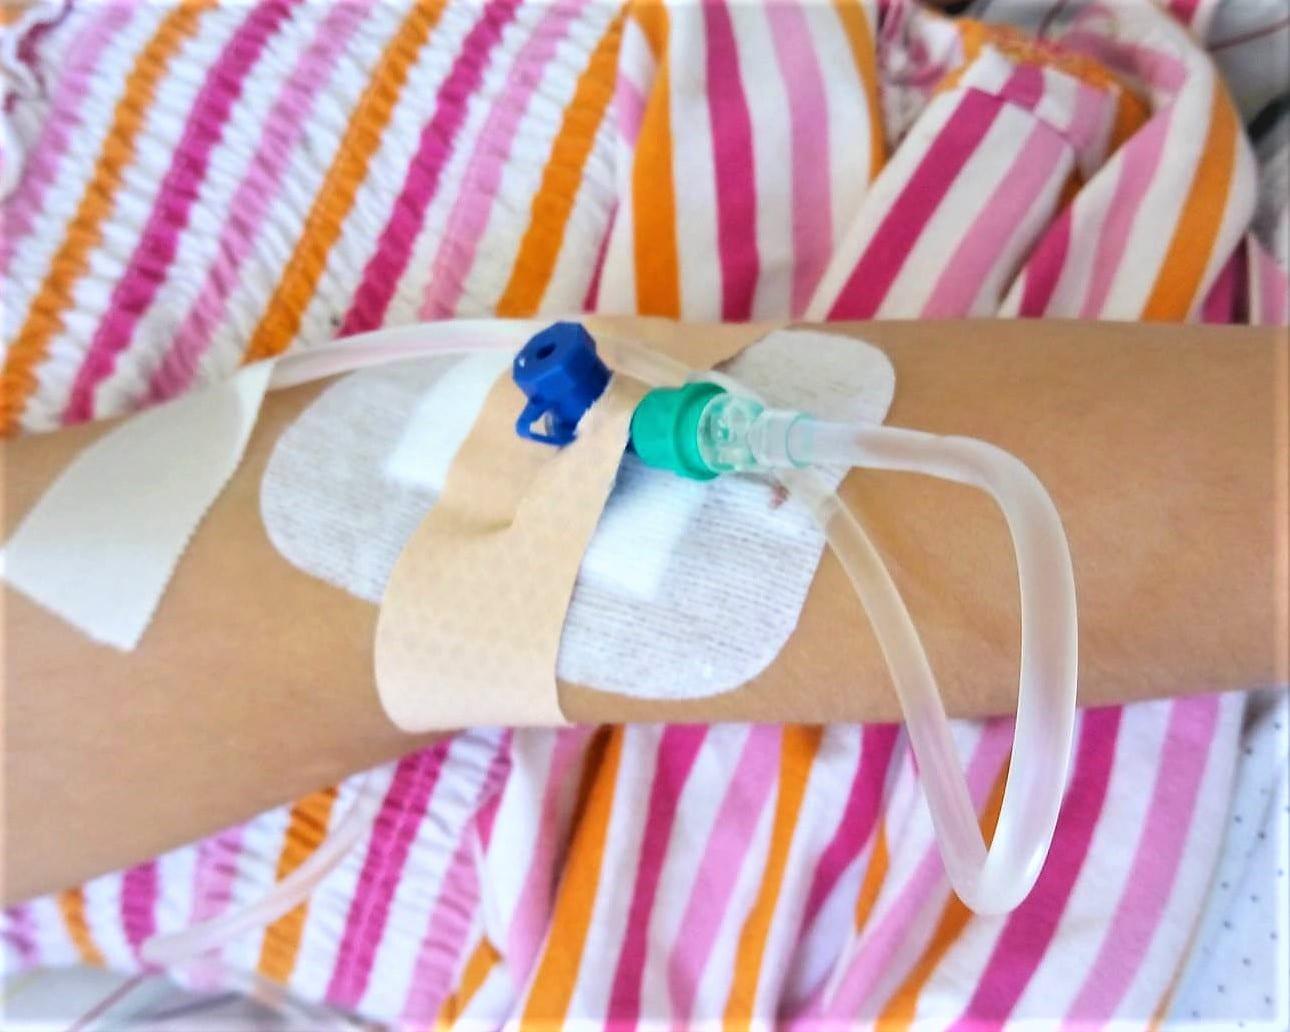 Schulkind im Krankenhaus, Verdacht auf Blinddarmentzündung, Infusionsnadel, Familienleben, Freitagslieblinge, Puddingklecks, Mamablog